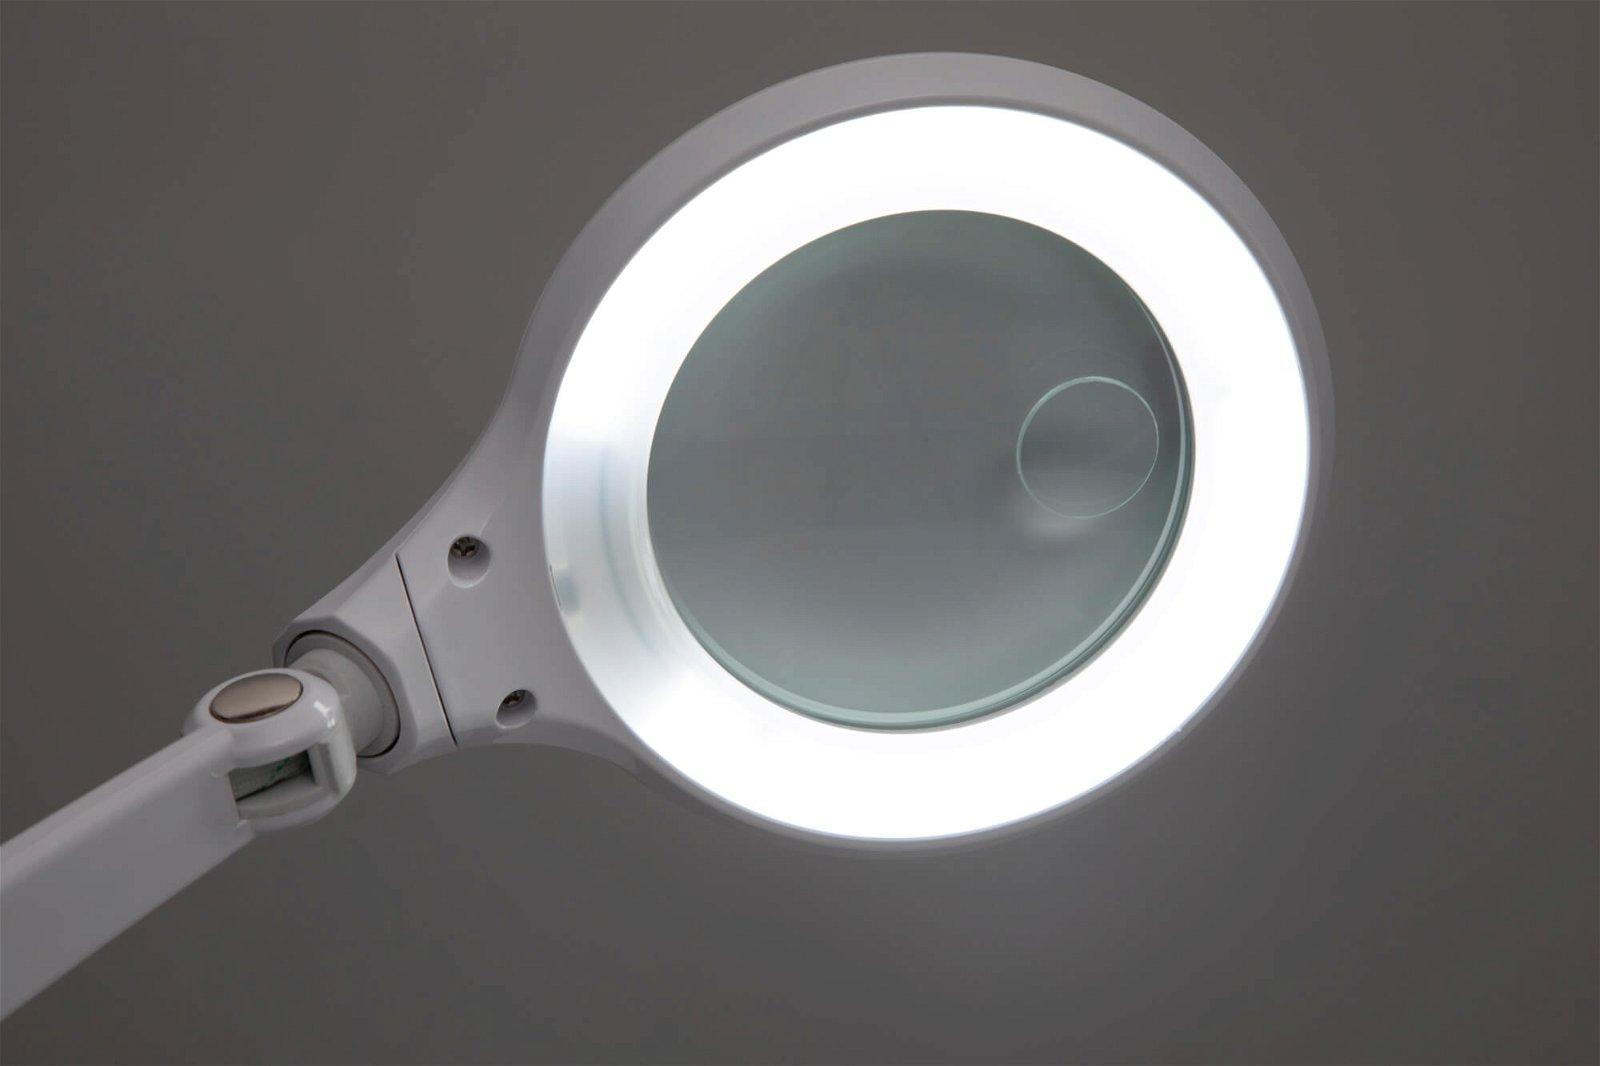 LED-Lupenleuchte MAULiri, weiß, dimmbar